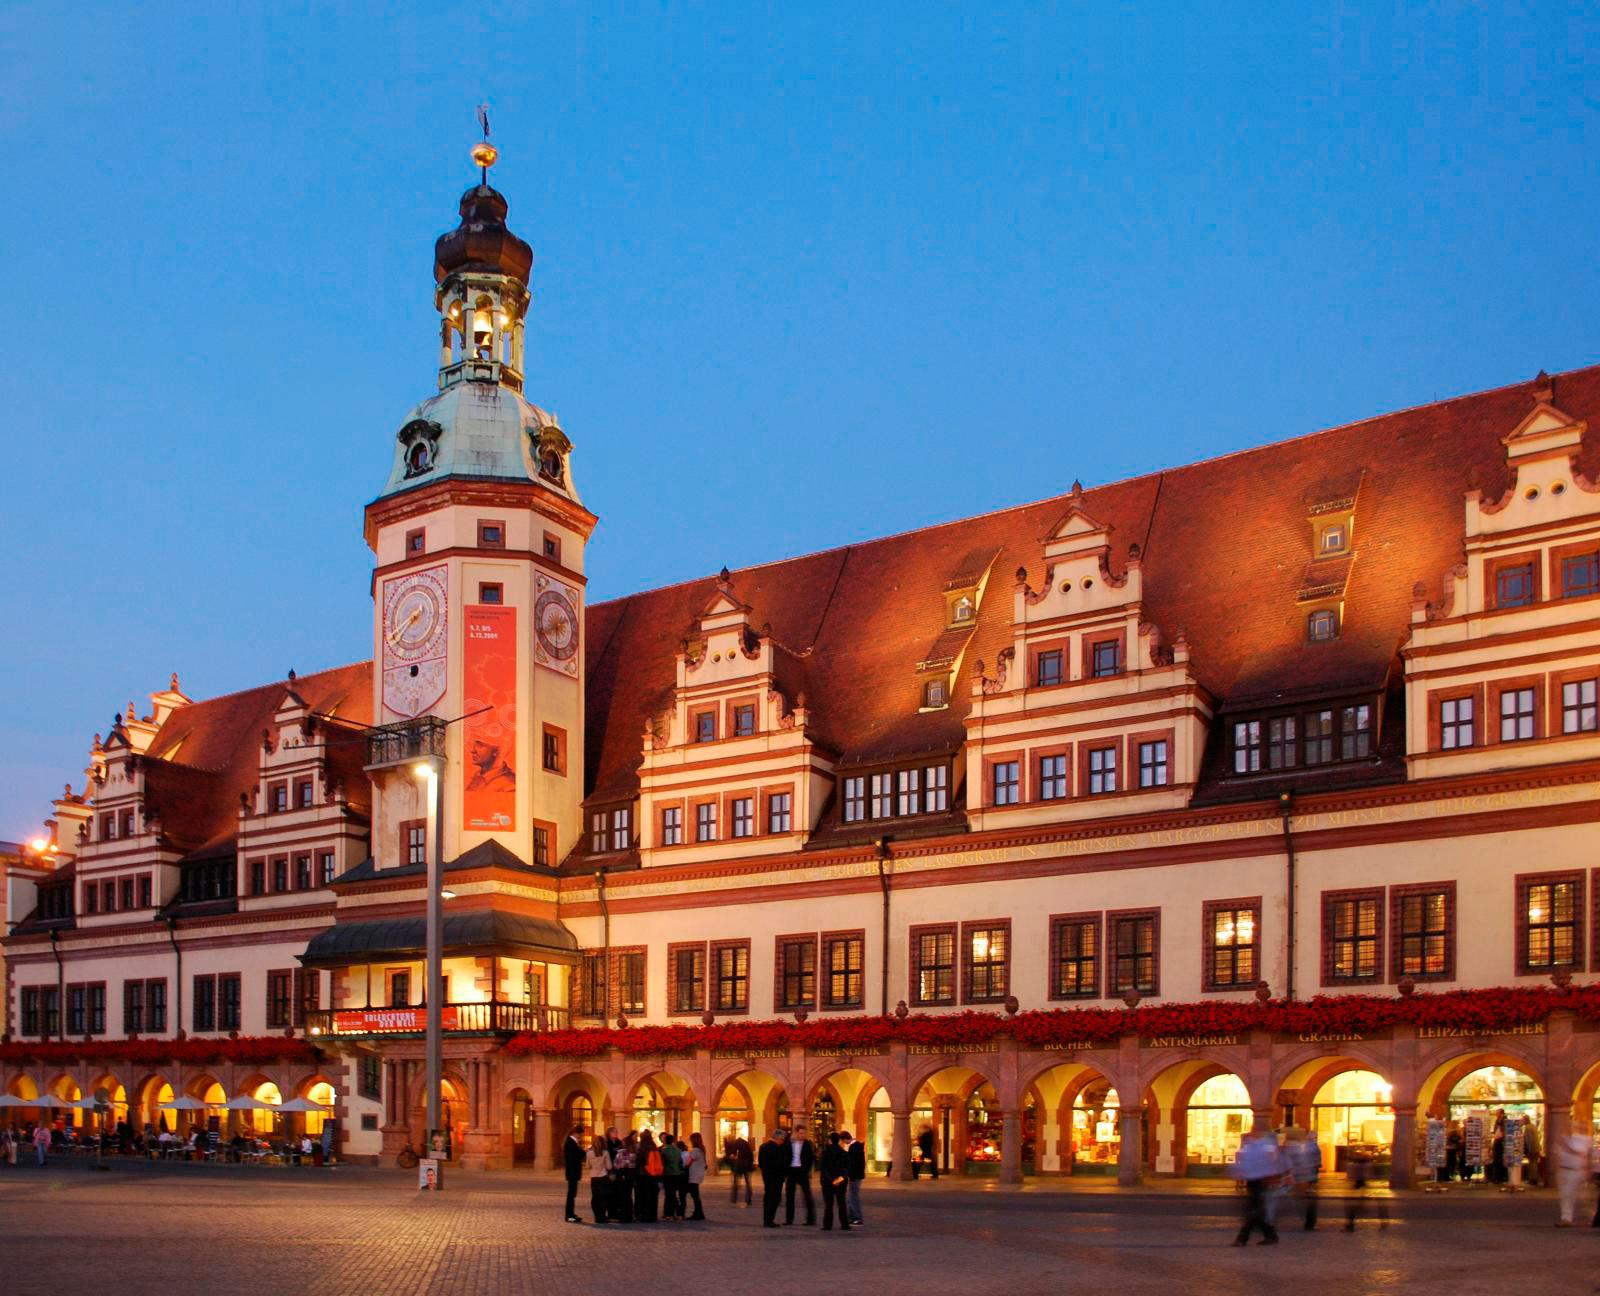 De mooiste steden in Saksen - Leipzig